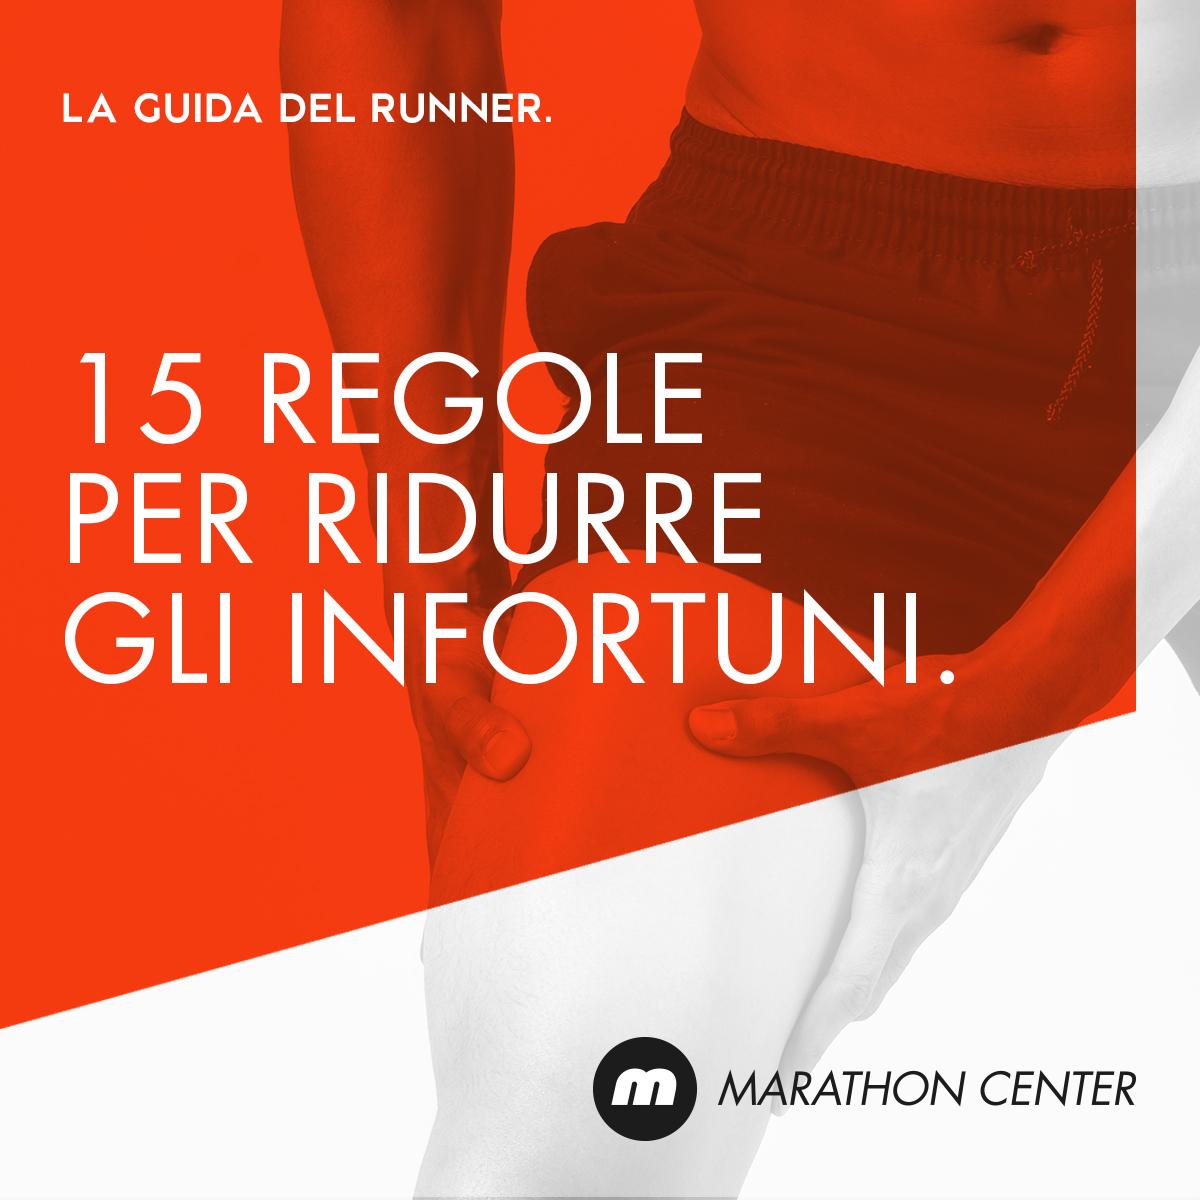 running-regole-rudurre-infortuni-marathon-sport-center